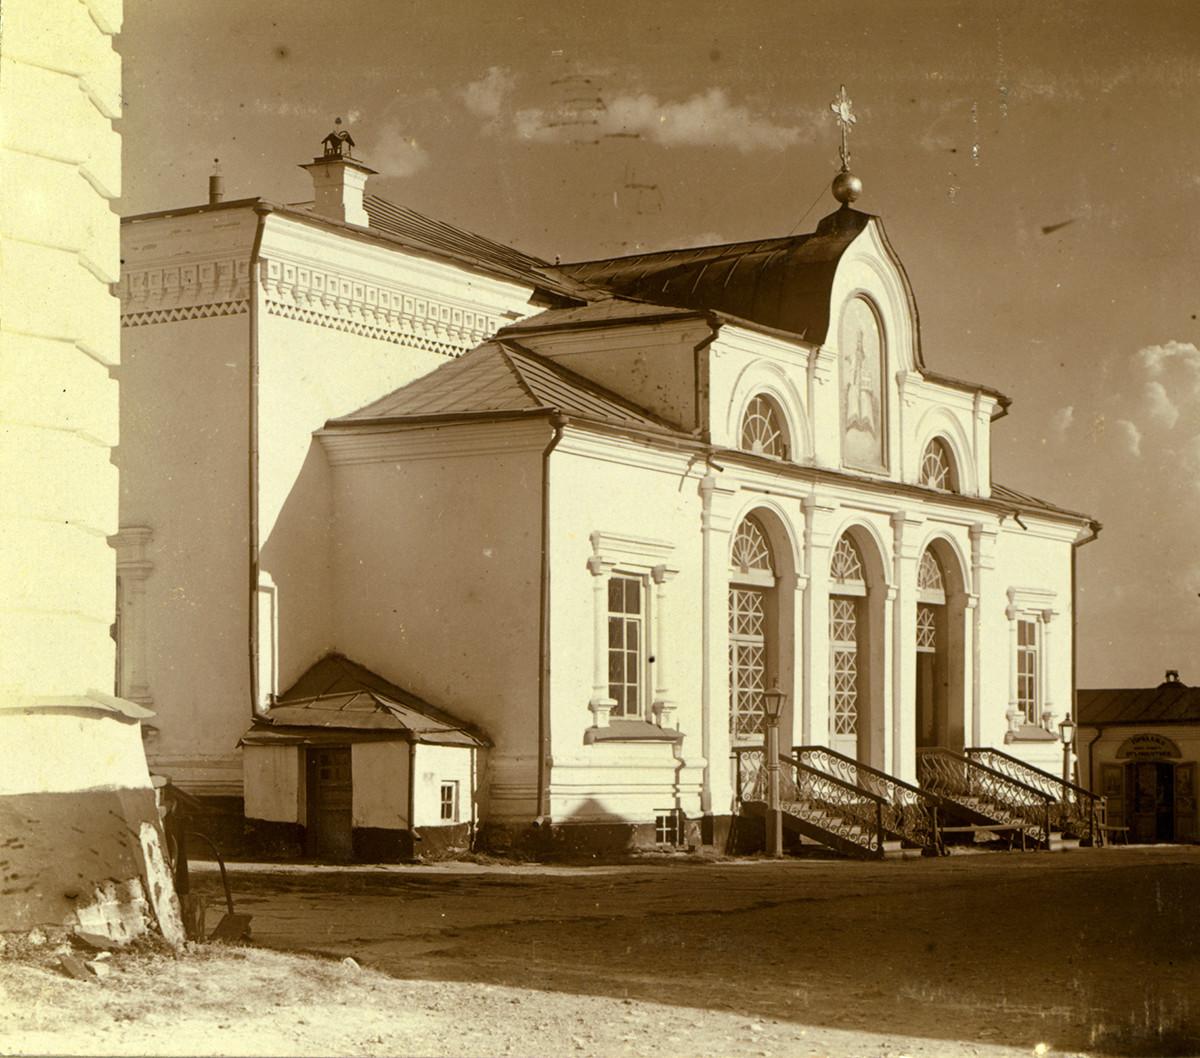 St. Nicholas Church, northwest view. Demolished, rebuilt in different form in 1998. Summer 1909.